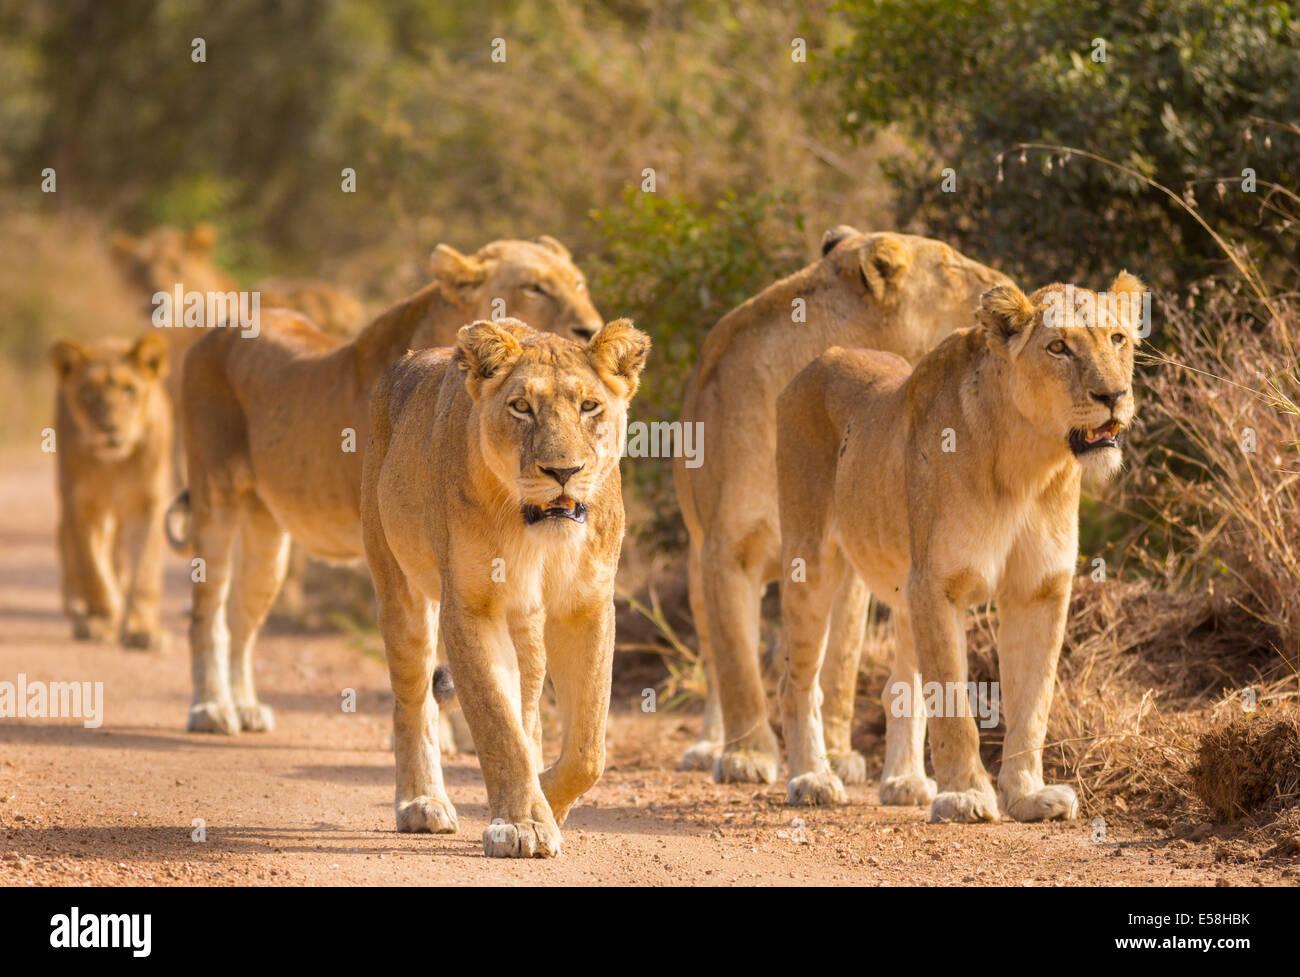 KRUGER NATIONAL PARK, SOUTH AFRICA - Pride of lions hunting near Biyamiti Camp. Panthera leo - Stock Image